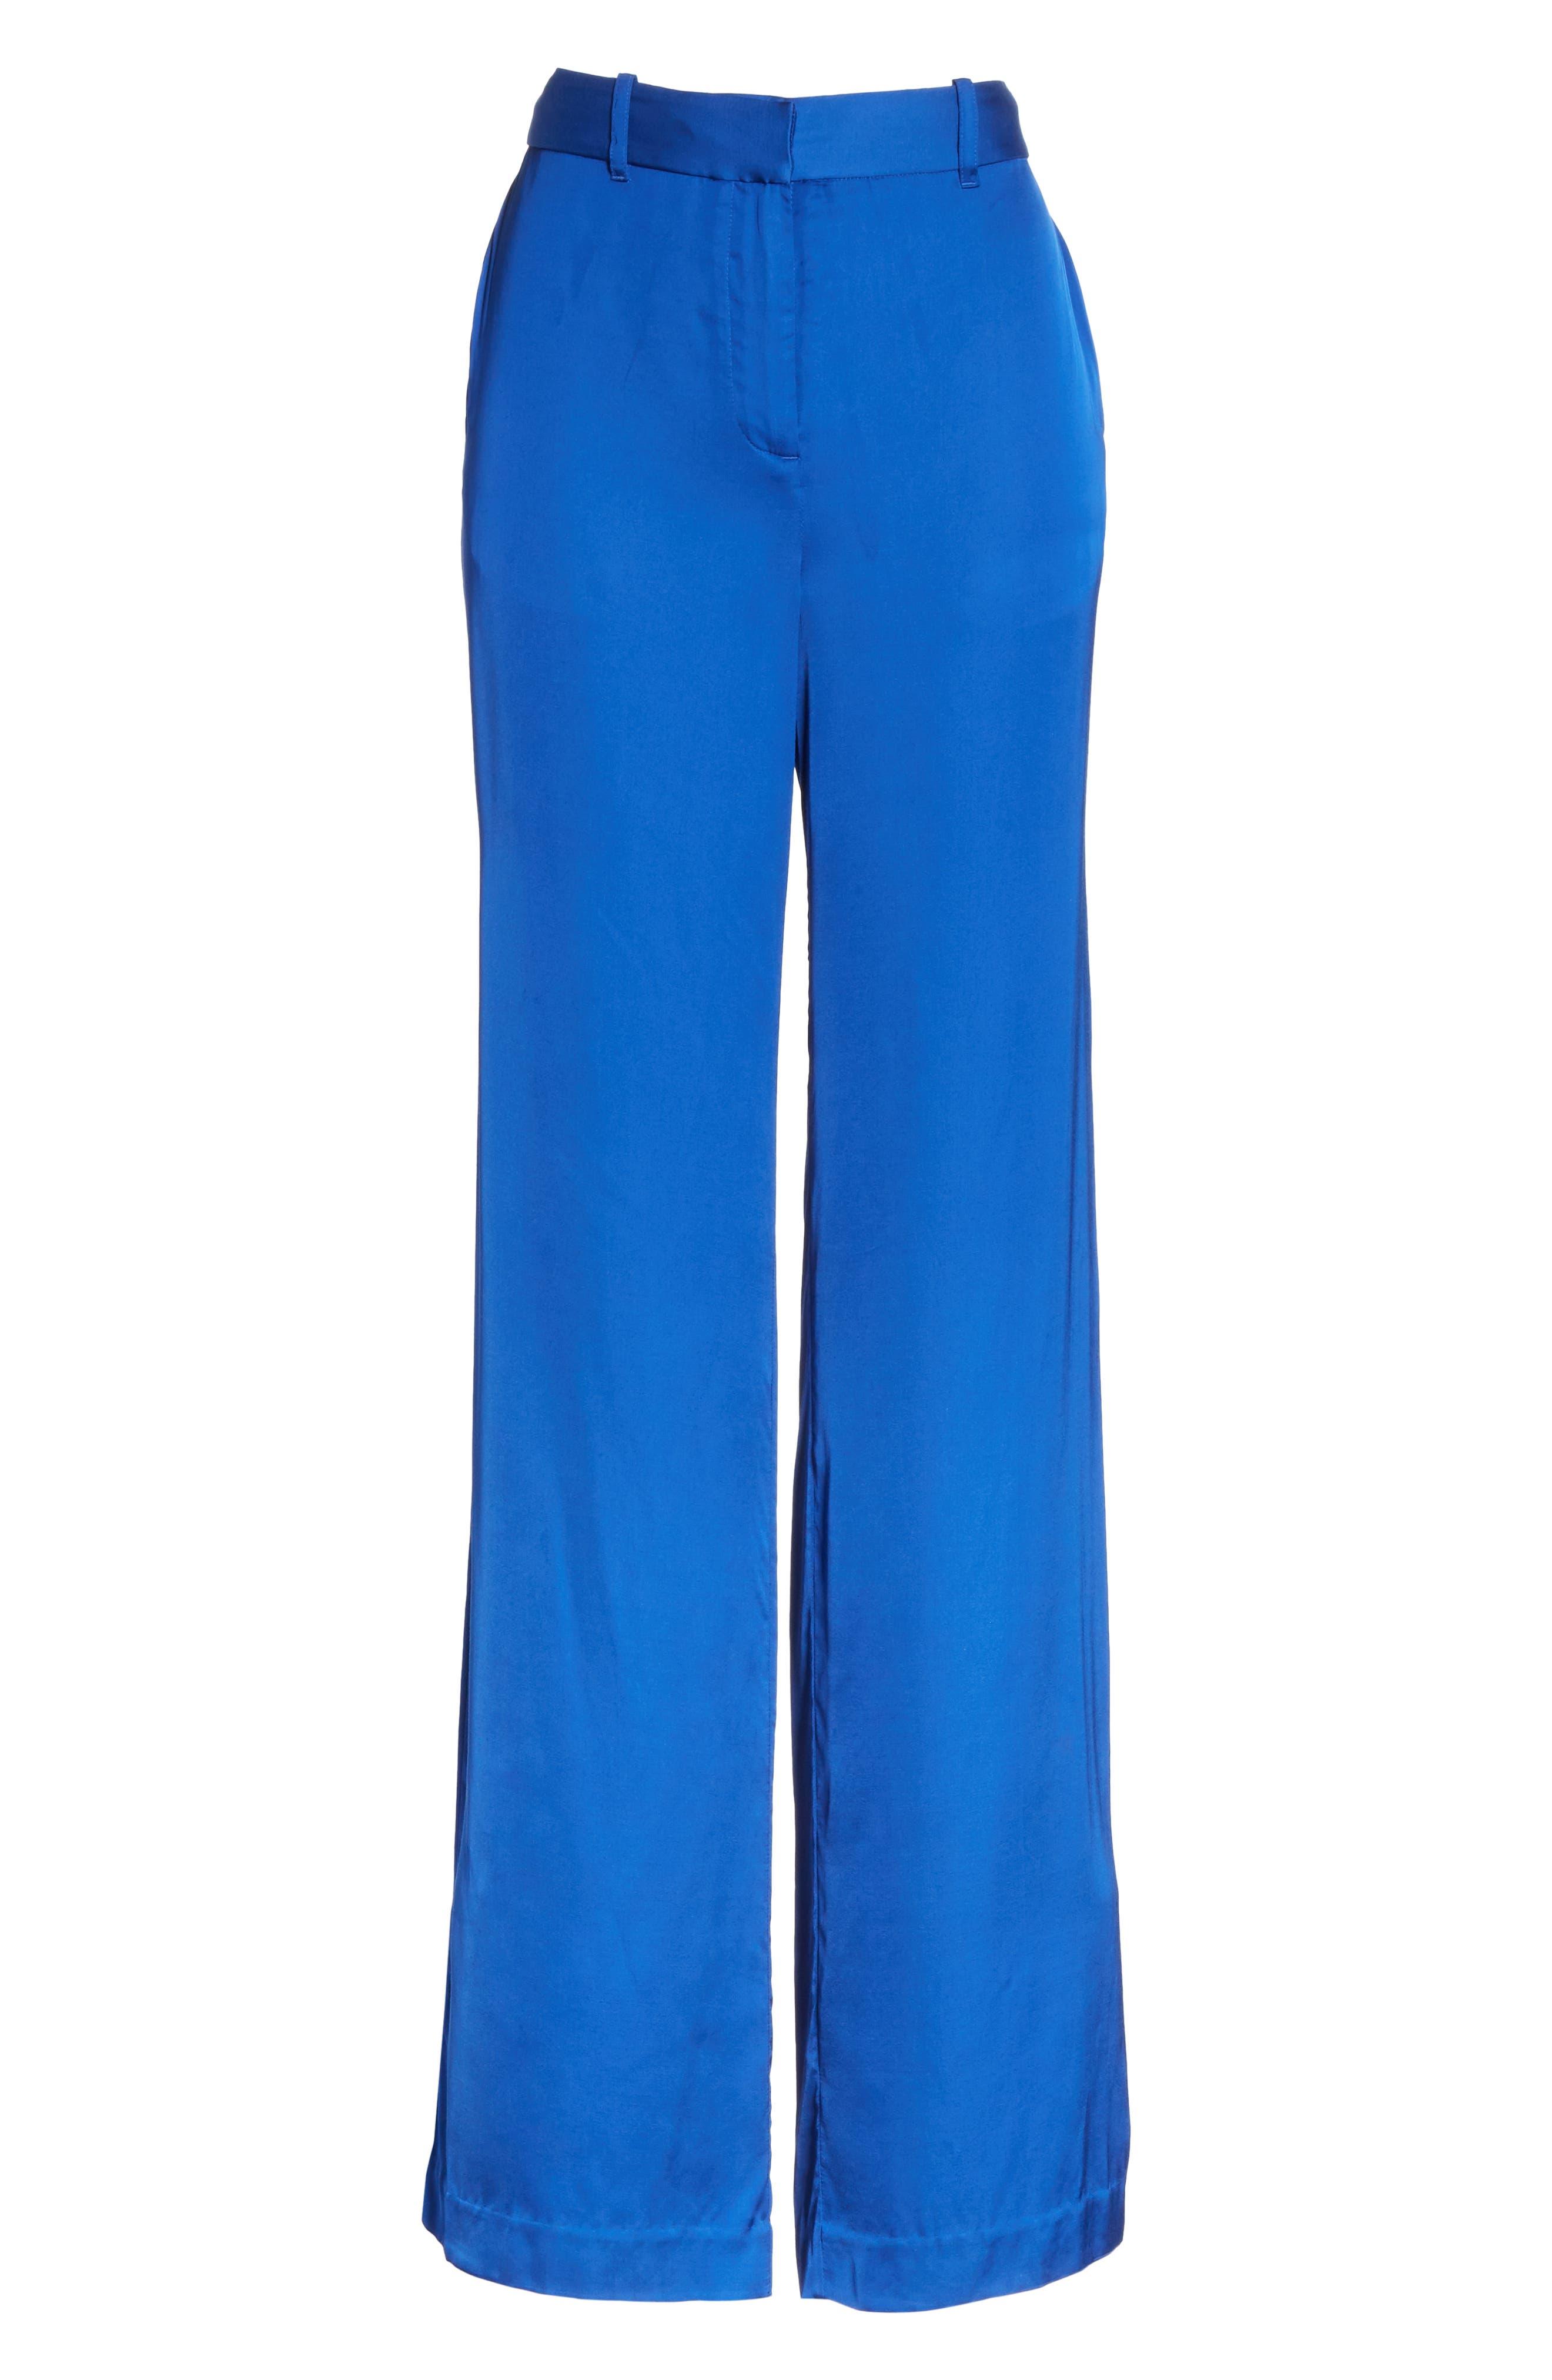 Arwen Trousers,                             Alternate thumbnail 7, color,                             HYPER BLUE